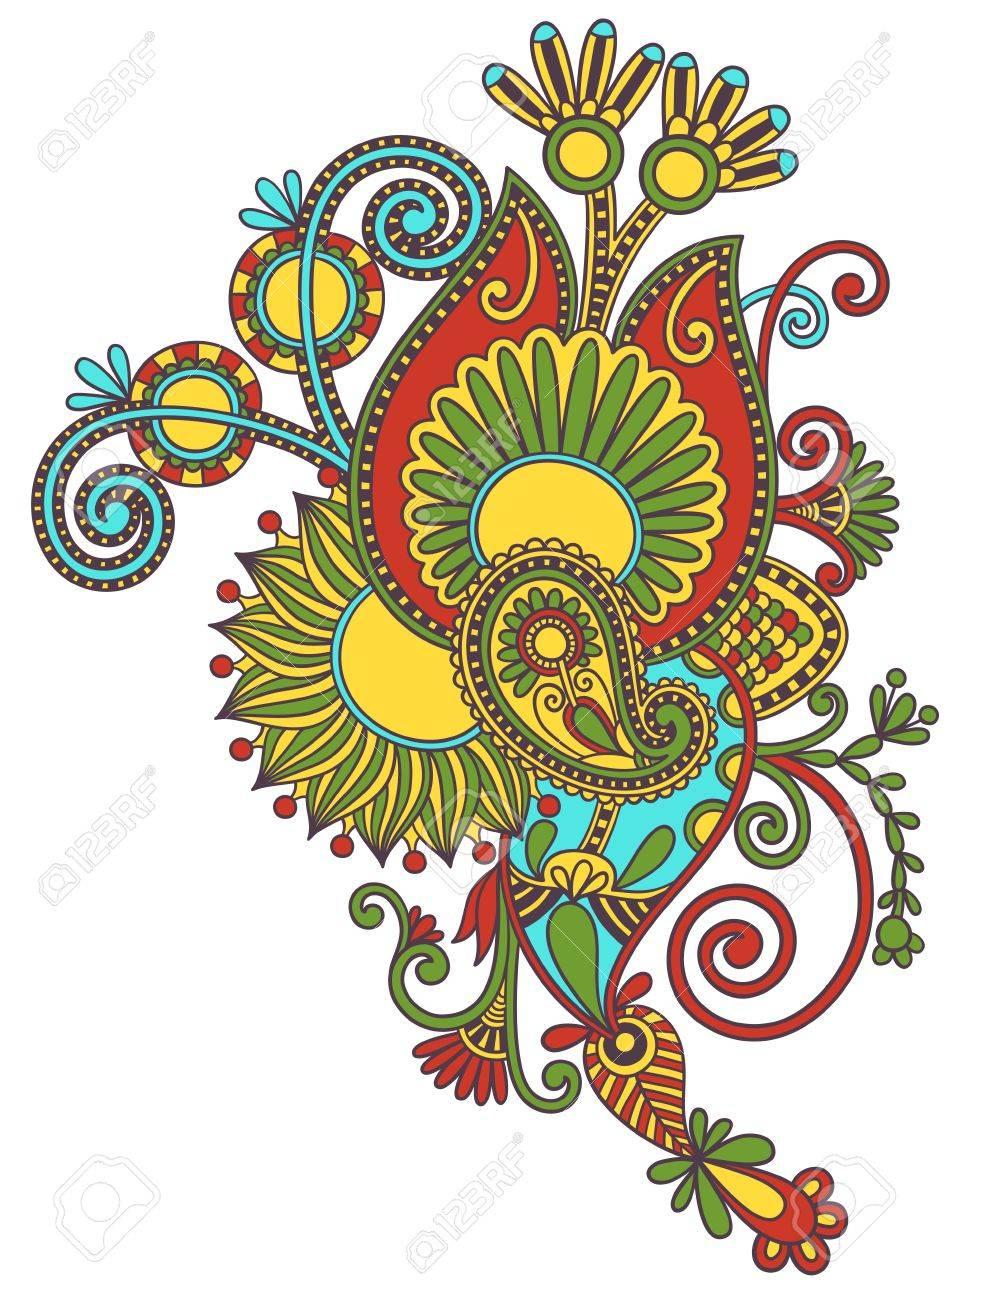 original hand draw line art ornate flower design. Ukrainian traditional style Stock Vector - 15110460